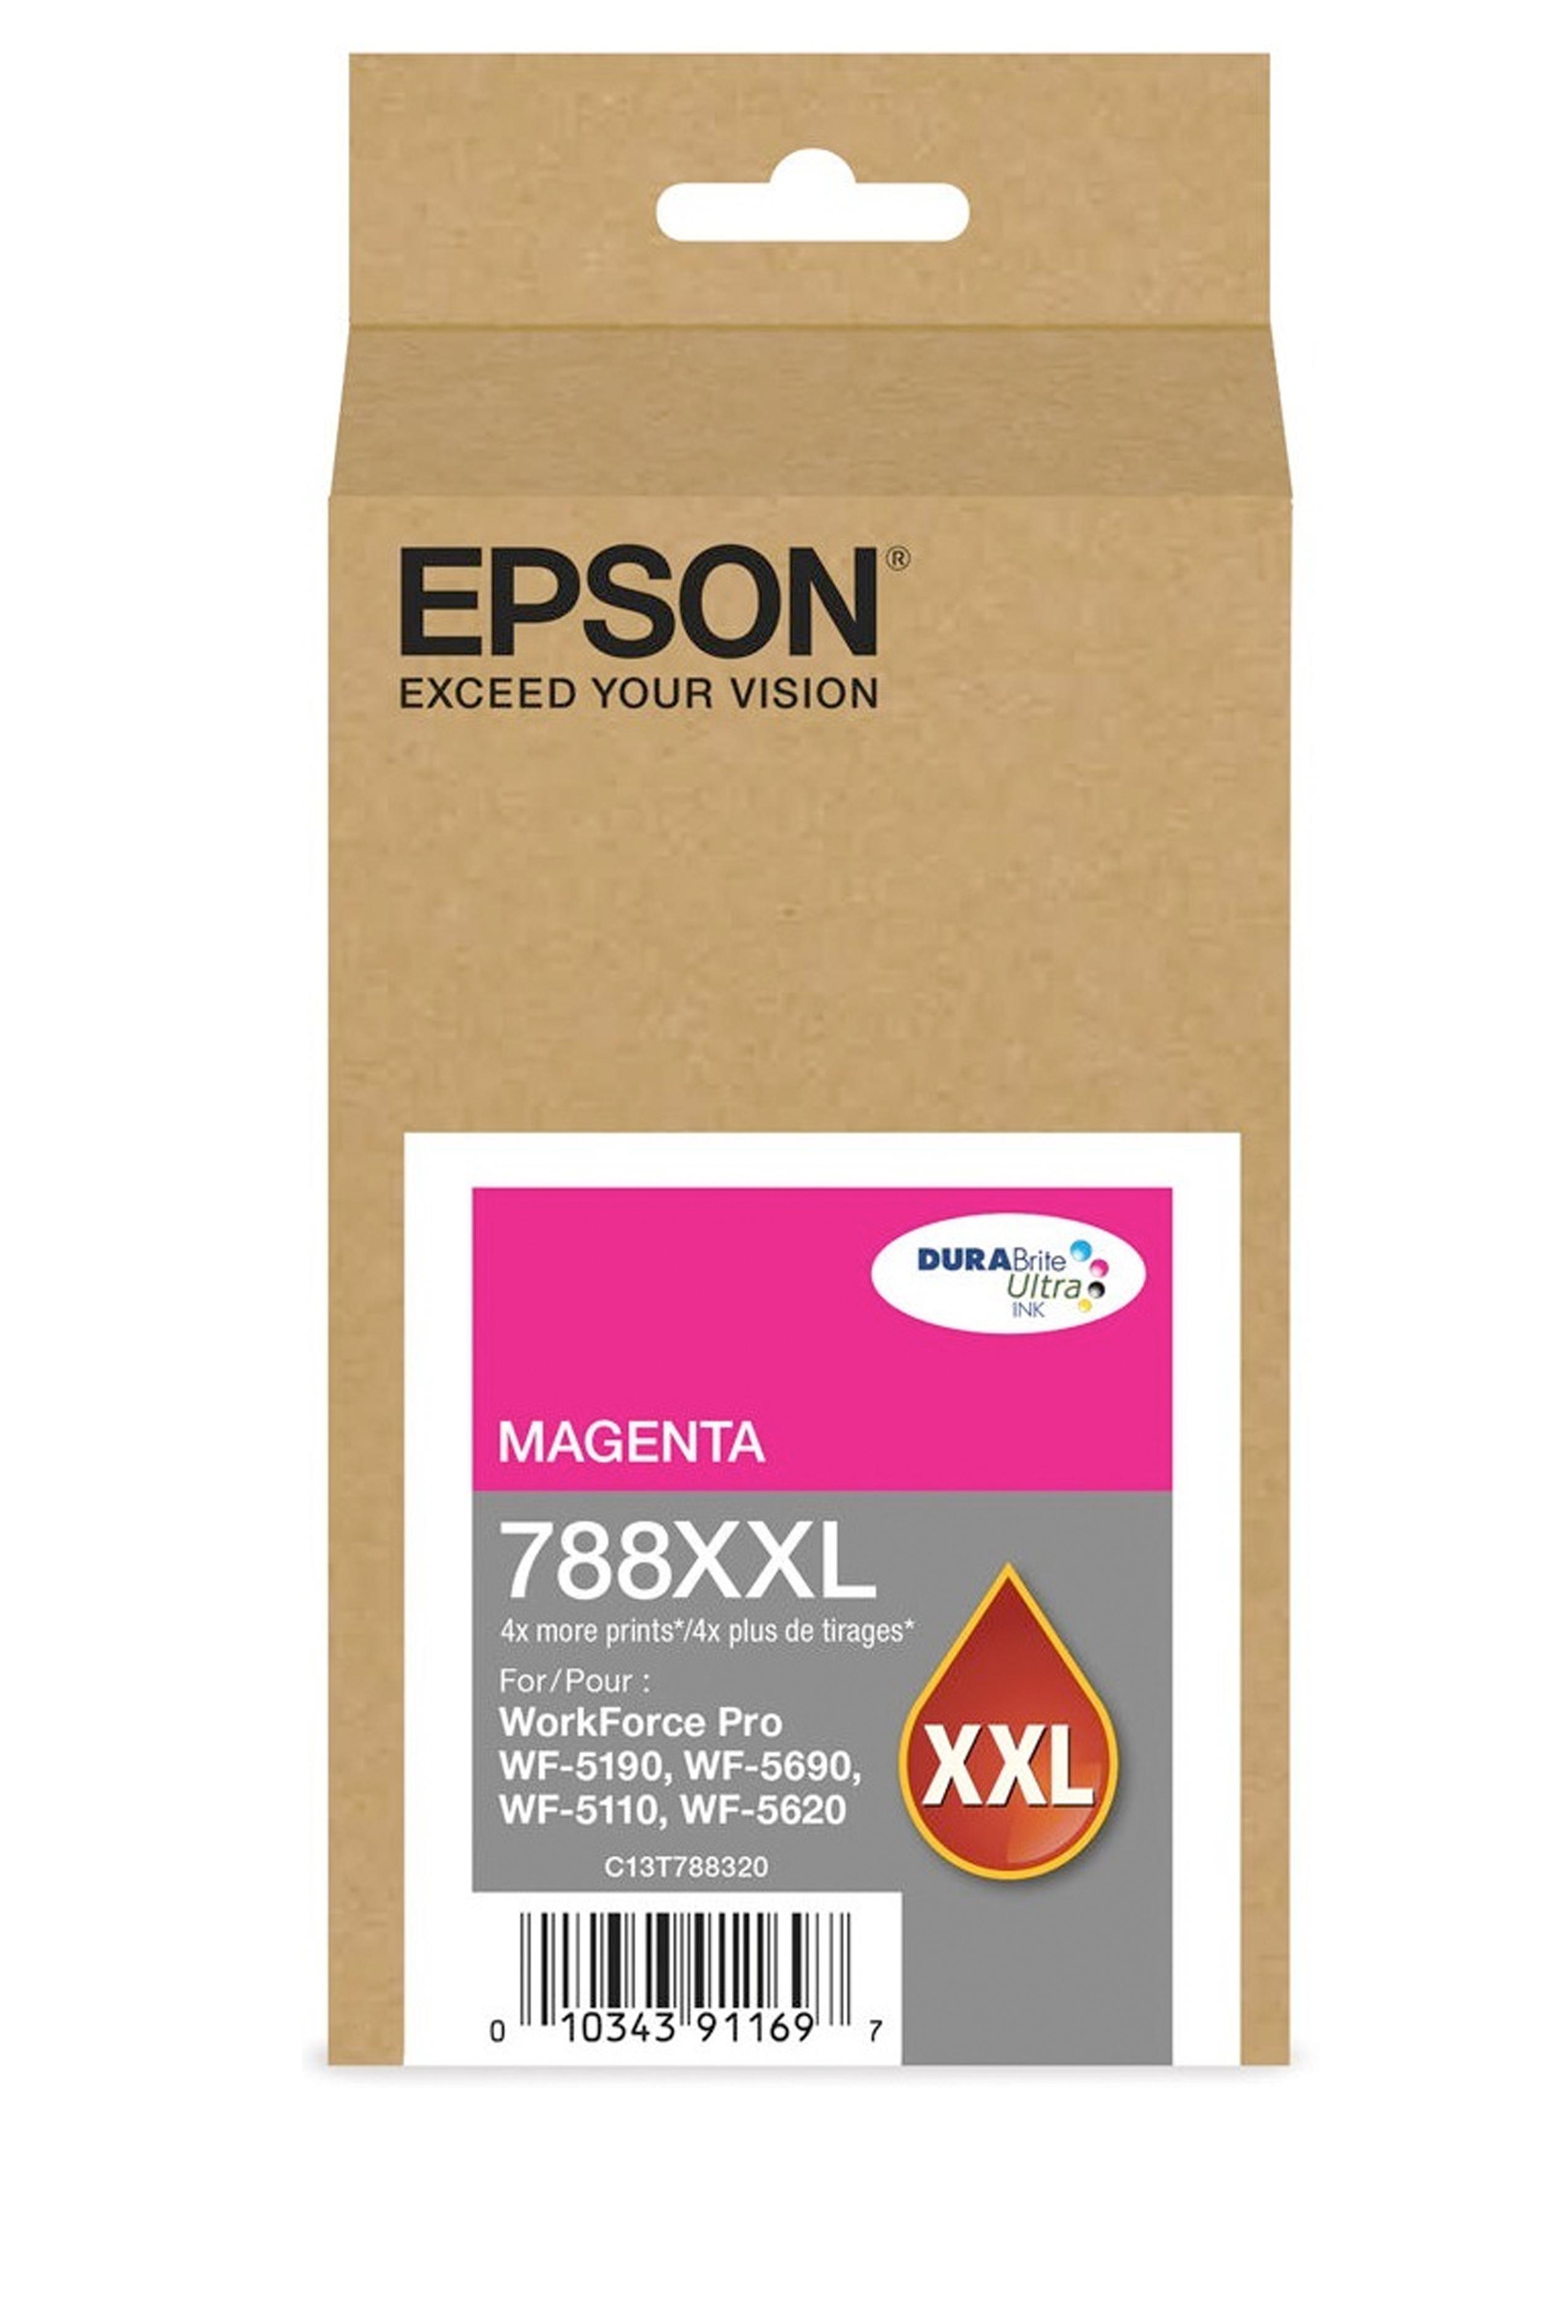 Epson EPSON XH MAGENTA INK (7000) (T748XXL320)